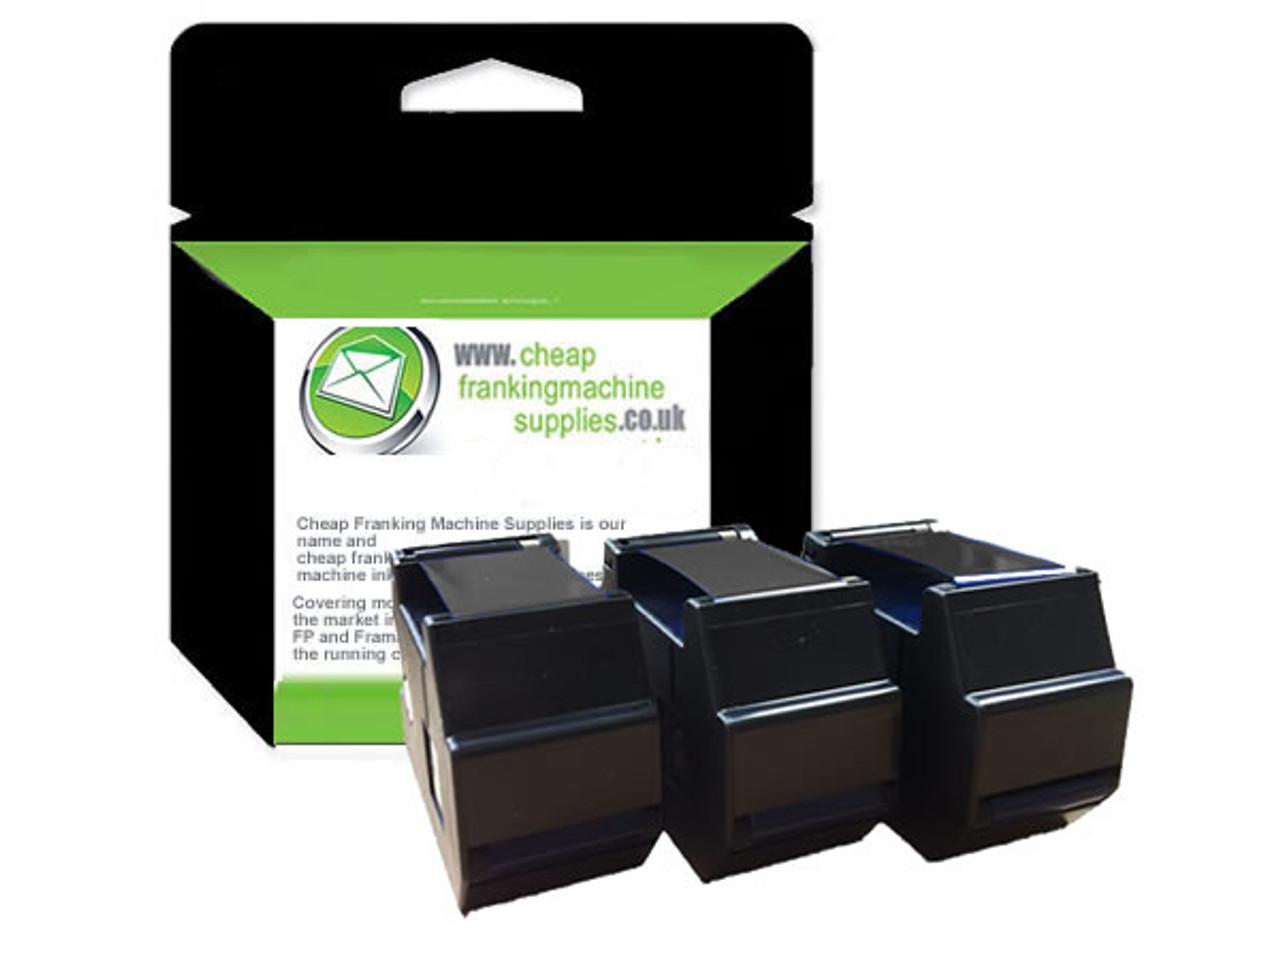 Compatible Francotyp Postalia FP OptiMail 30 Ink Ribbon - 3 Pack